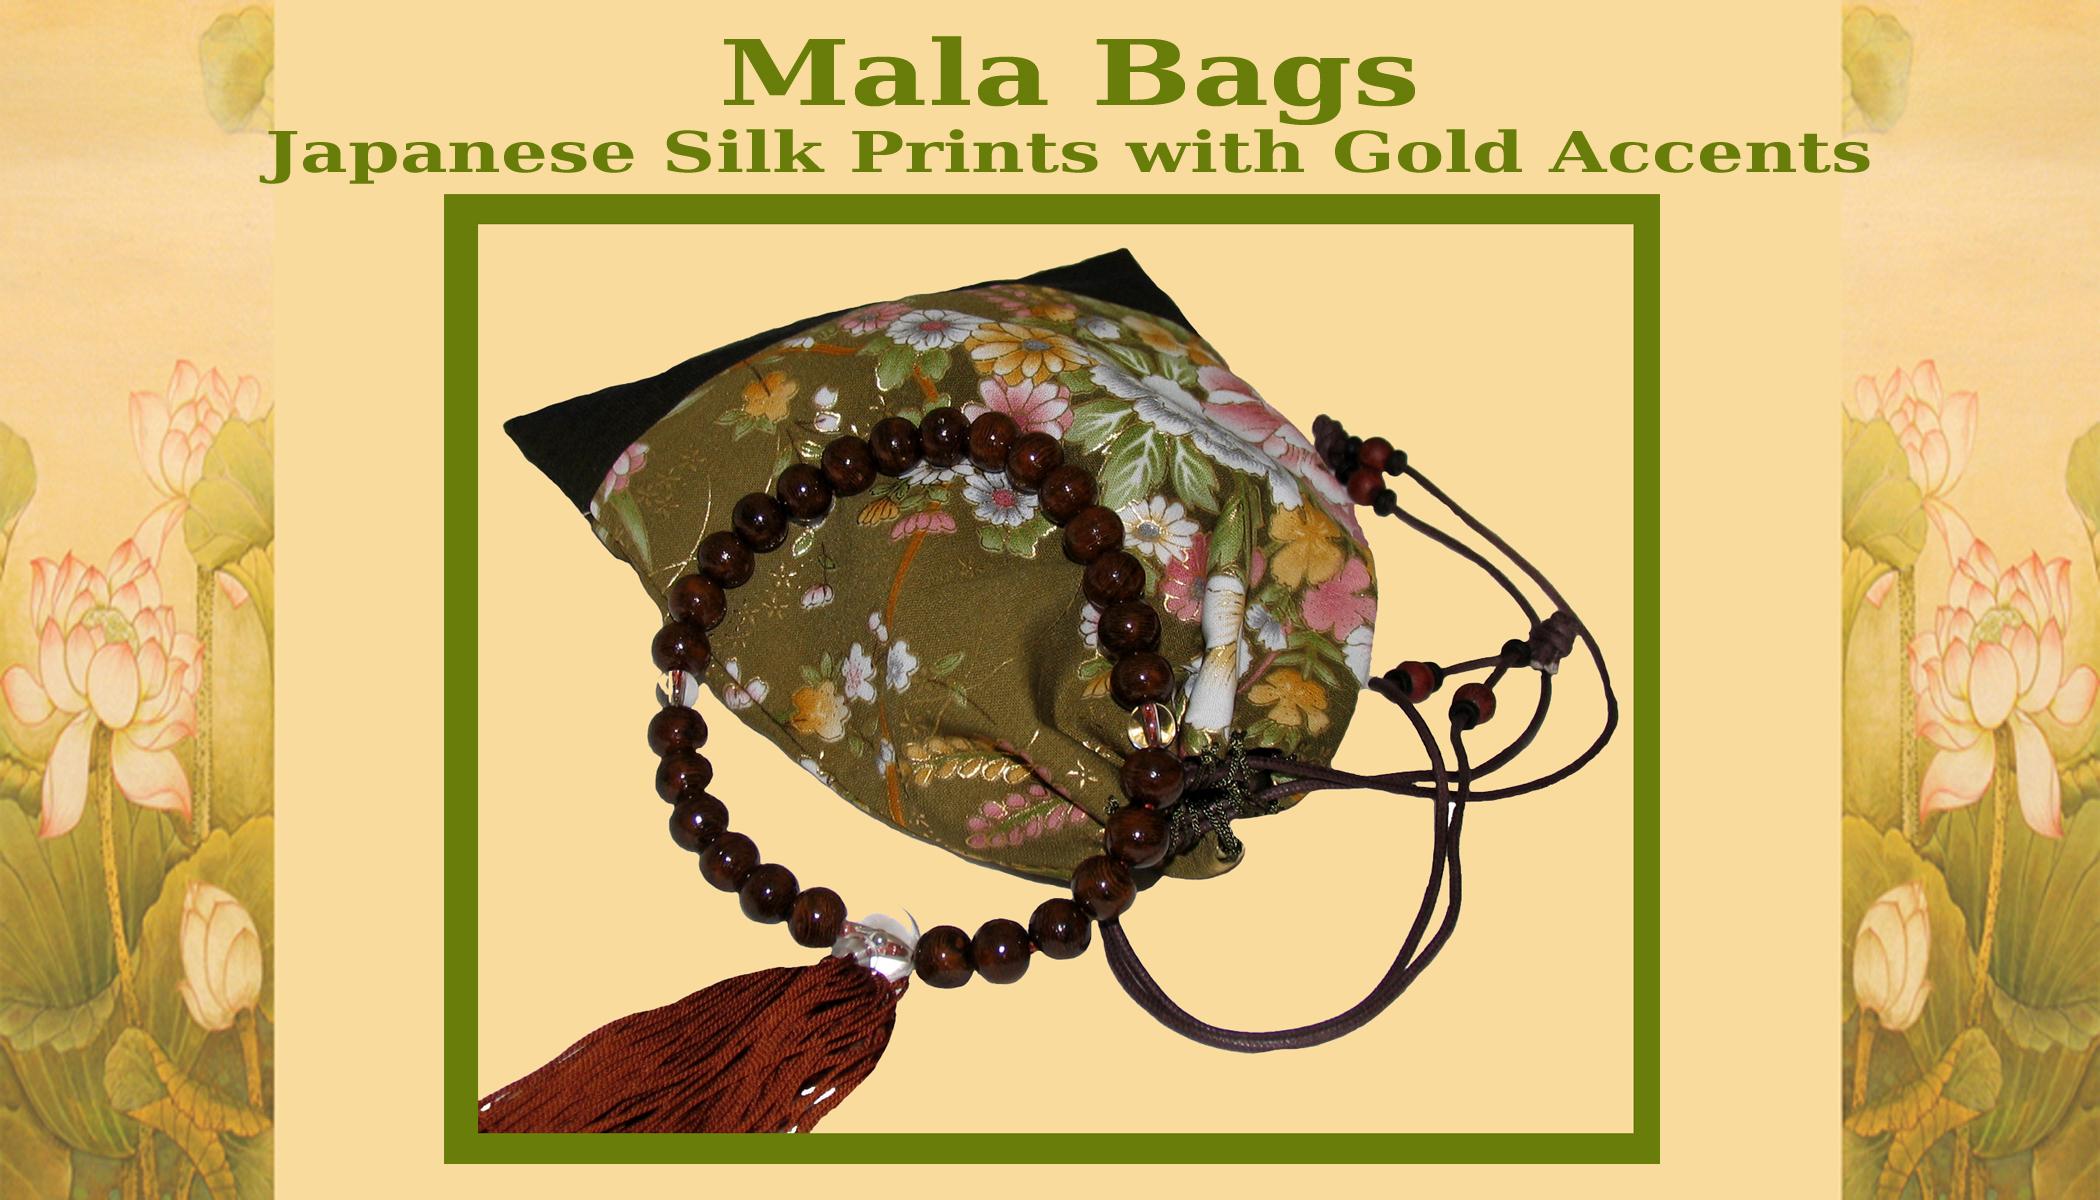 mala-bags-web.jpg